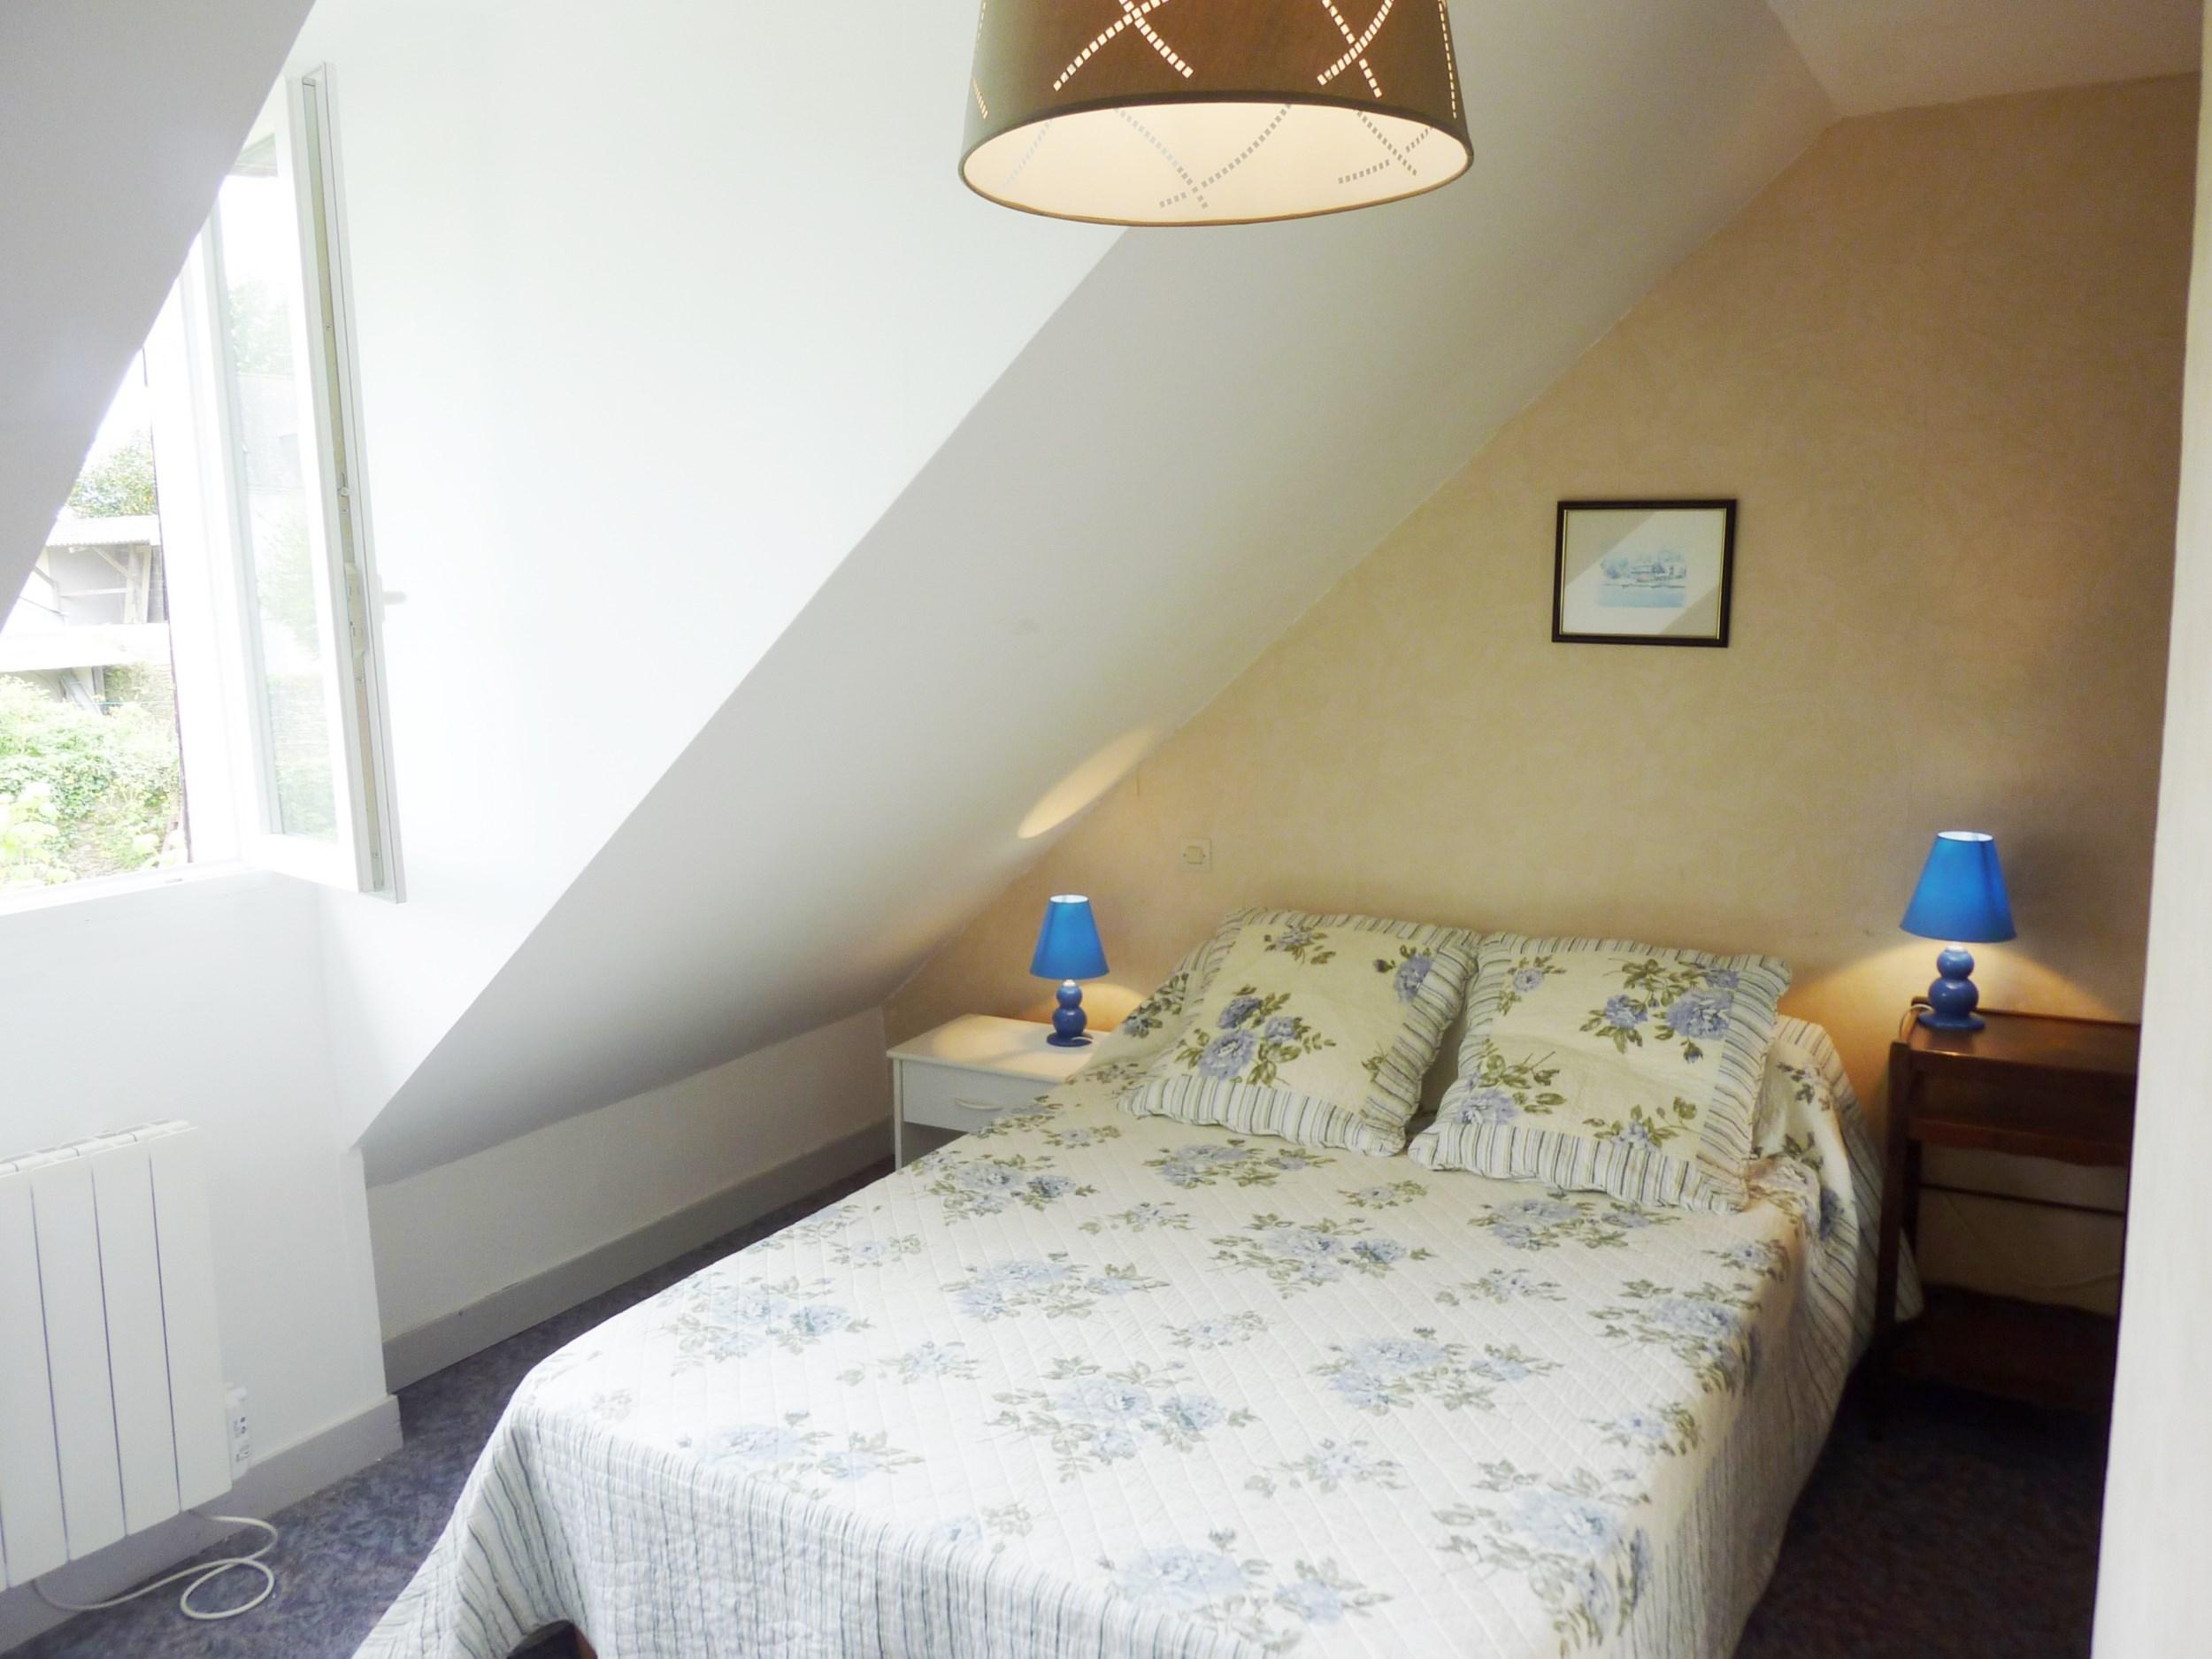 Location vacances Morbihan ; location vacance Bretagne sud ; Groix